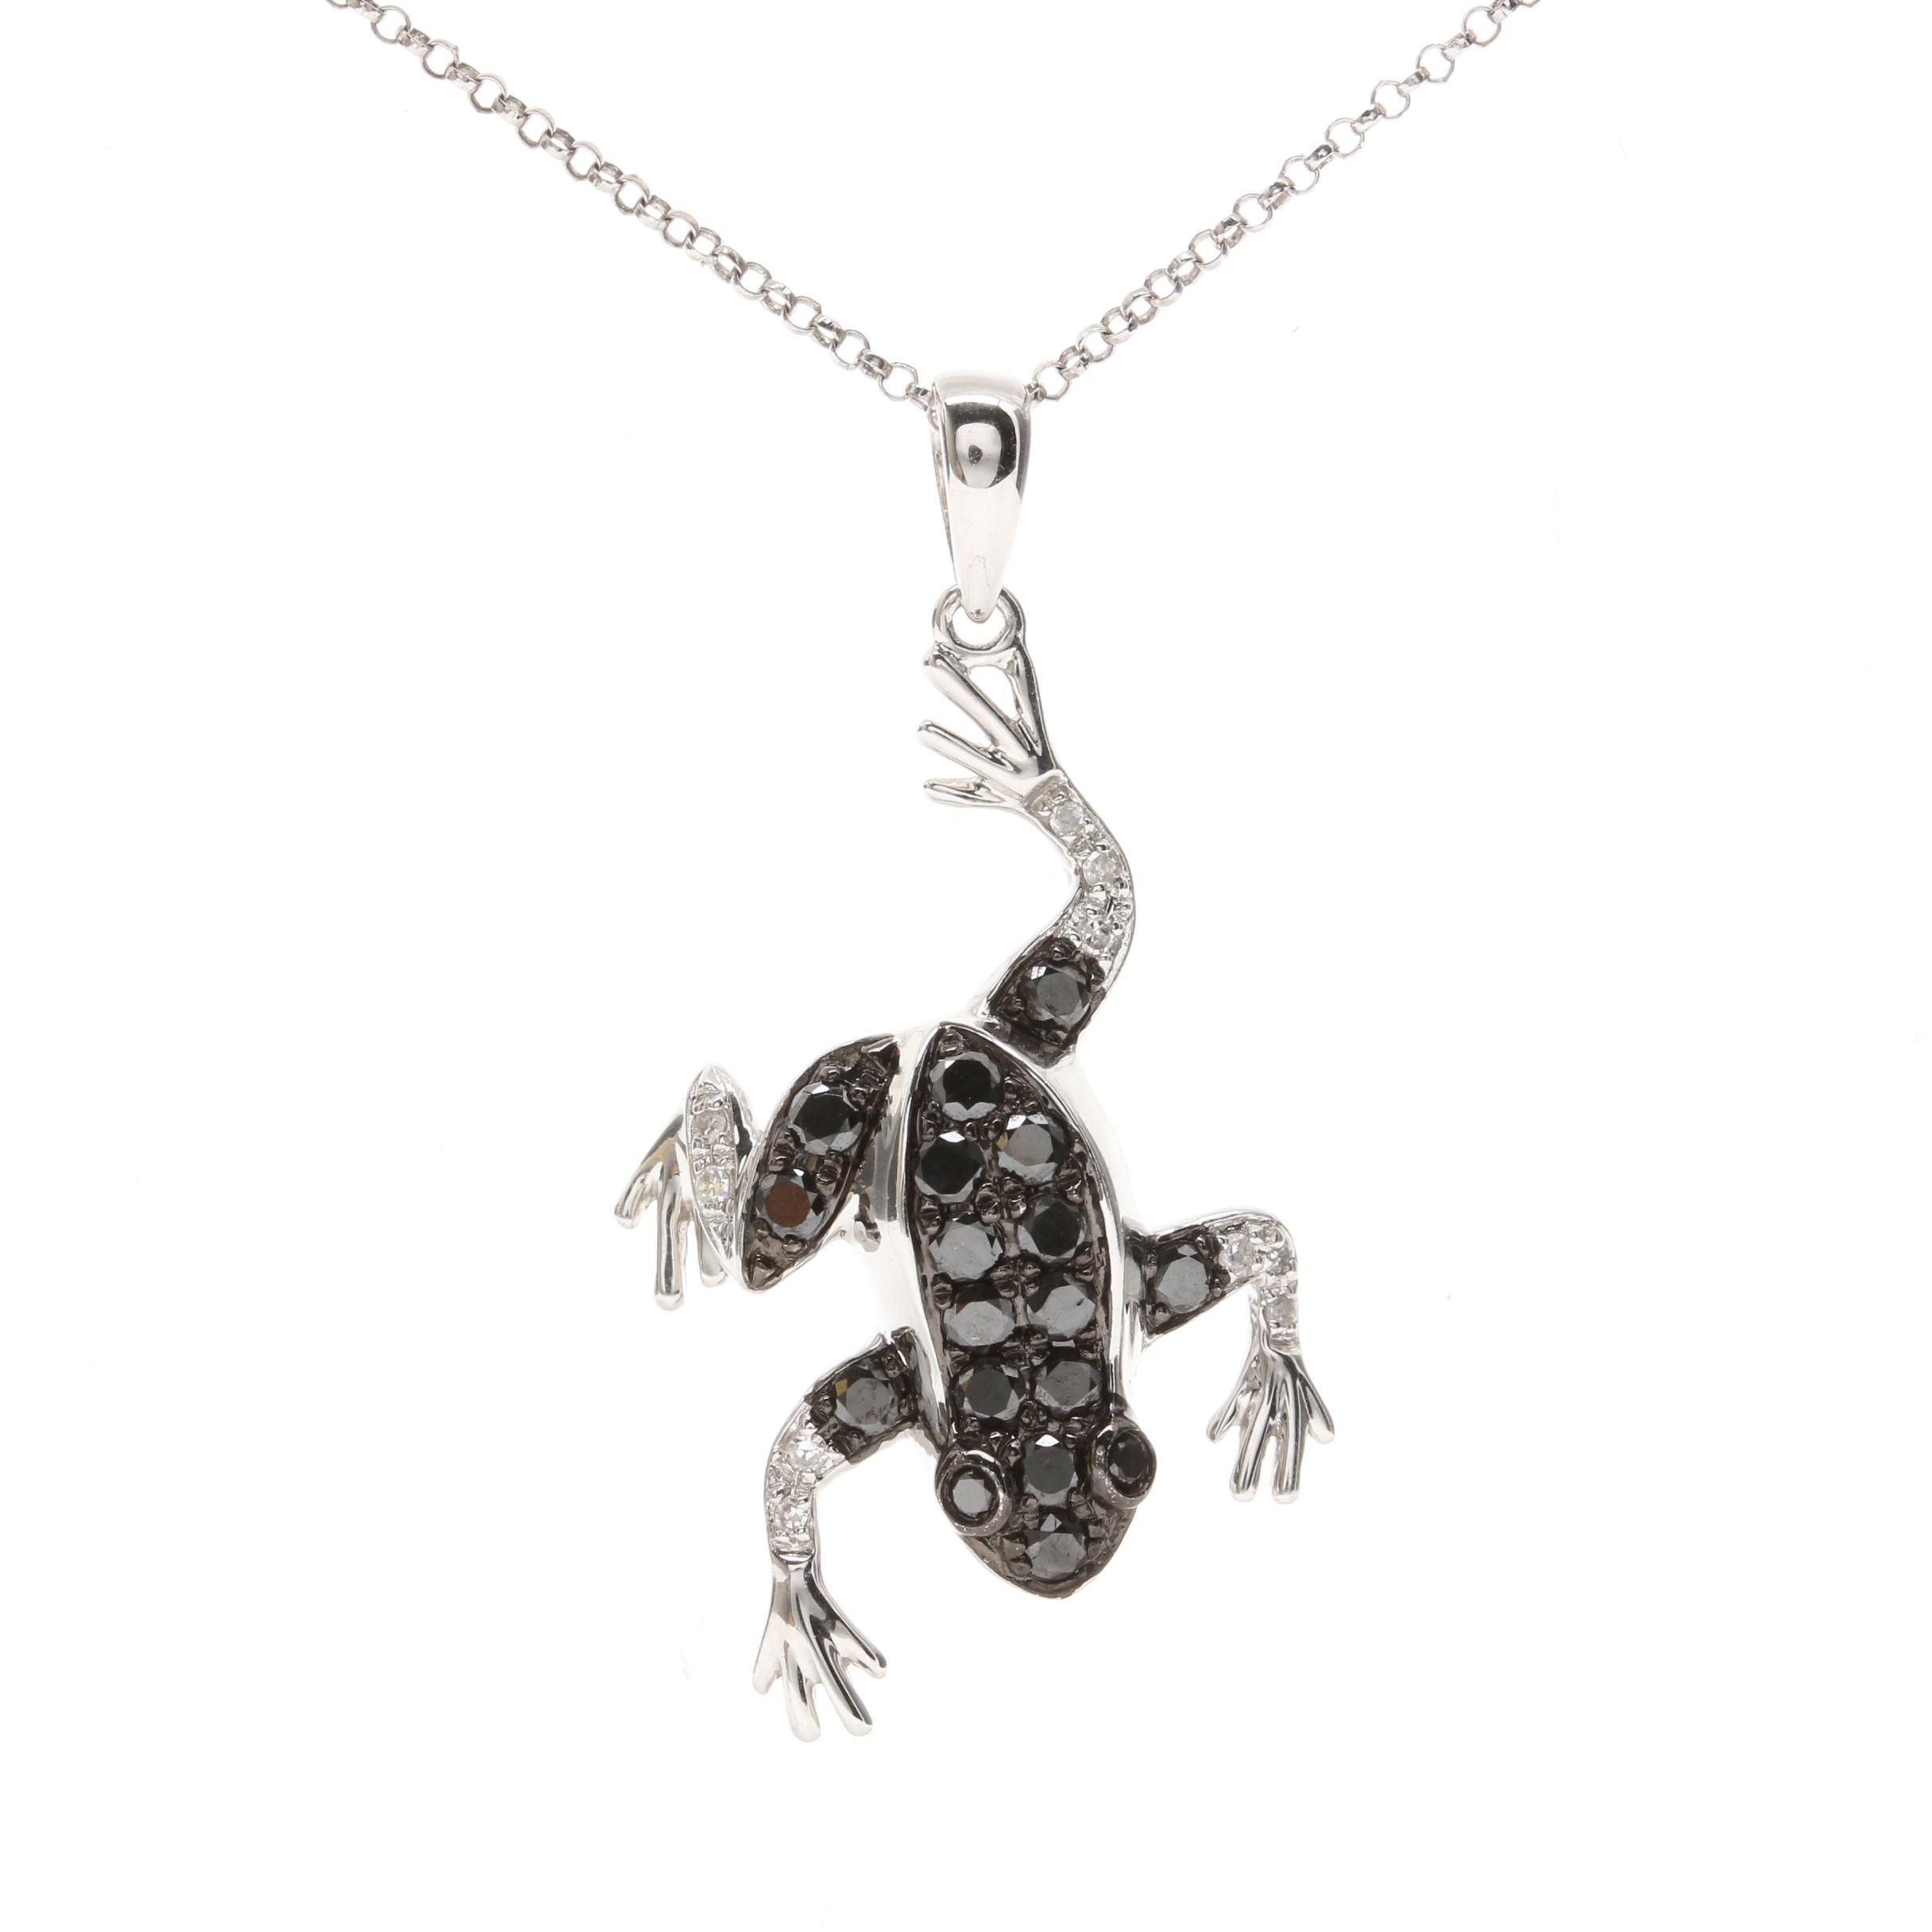 14K White Gold Diamond Frog Pendant Necklace